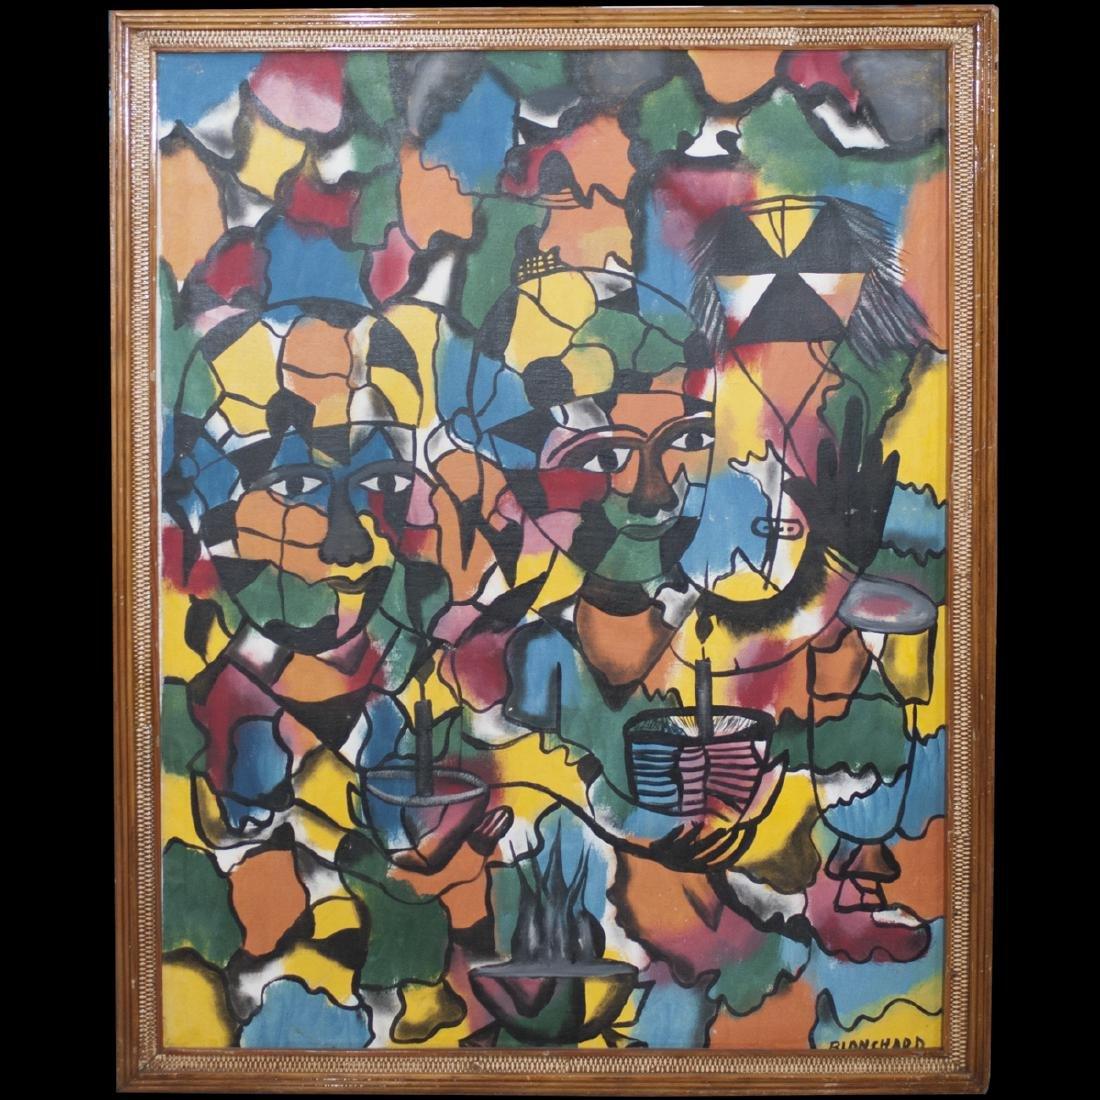 Sisson Blanchard (Haitian 1929-1981)